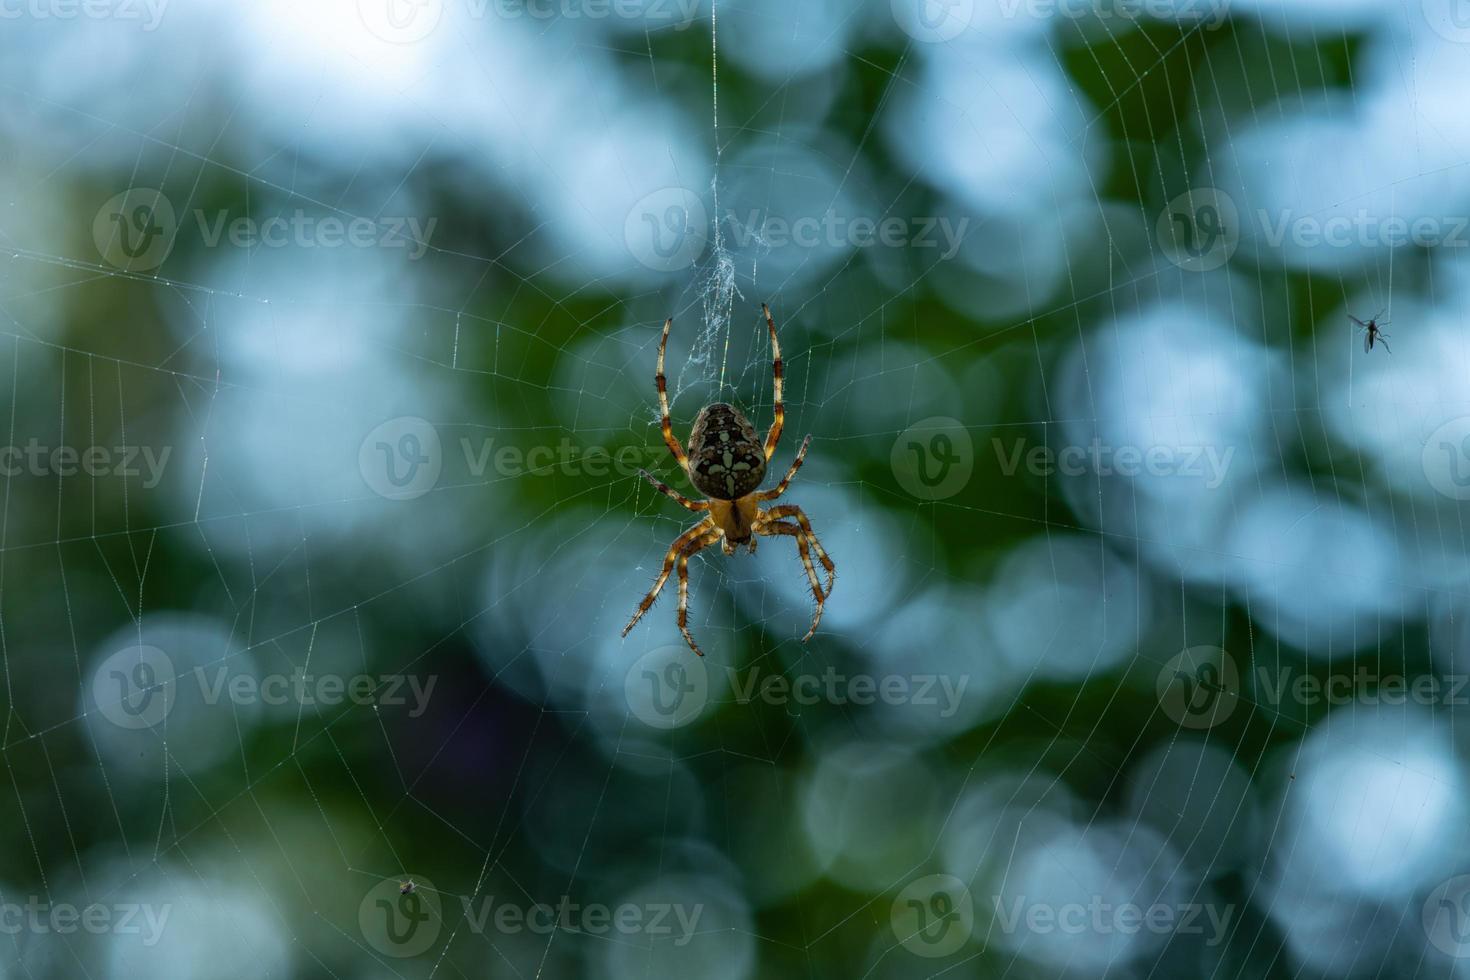 ragno da giardino con sfondo bokeh foto